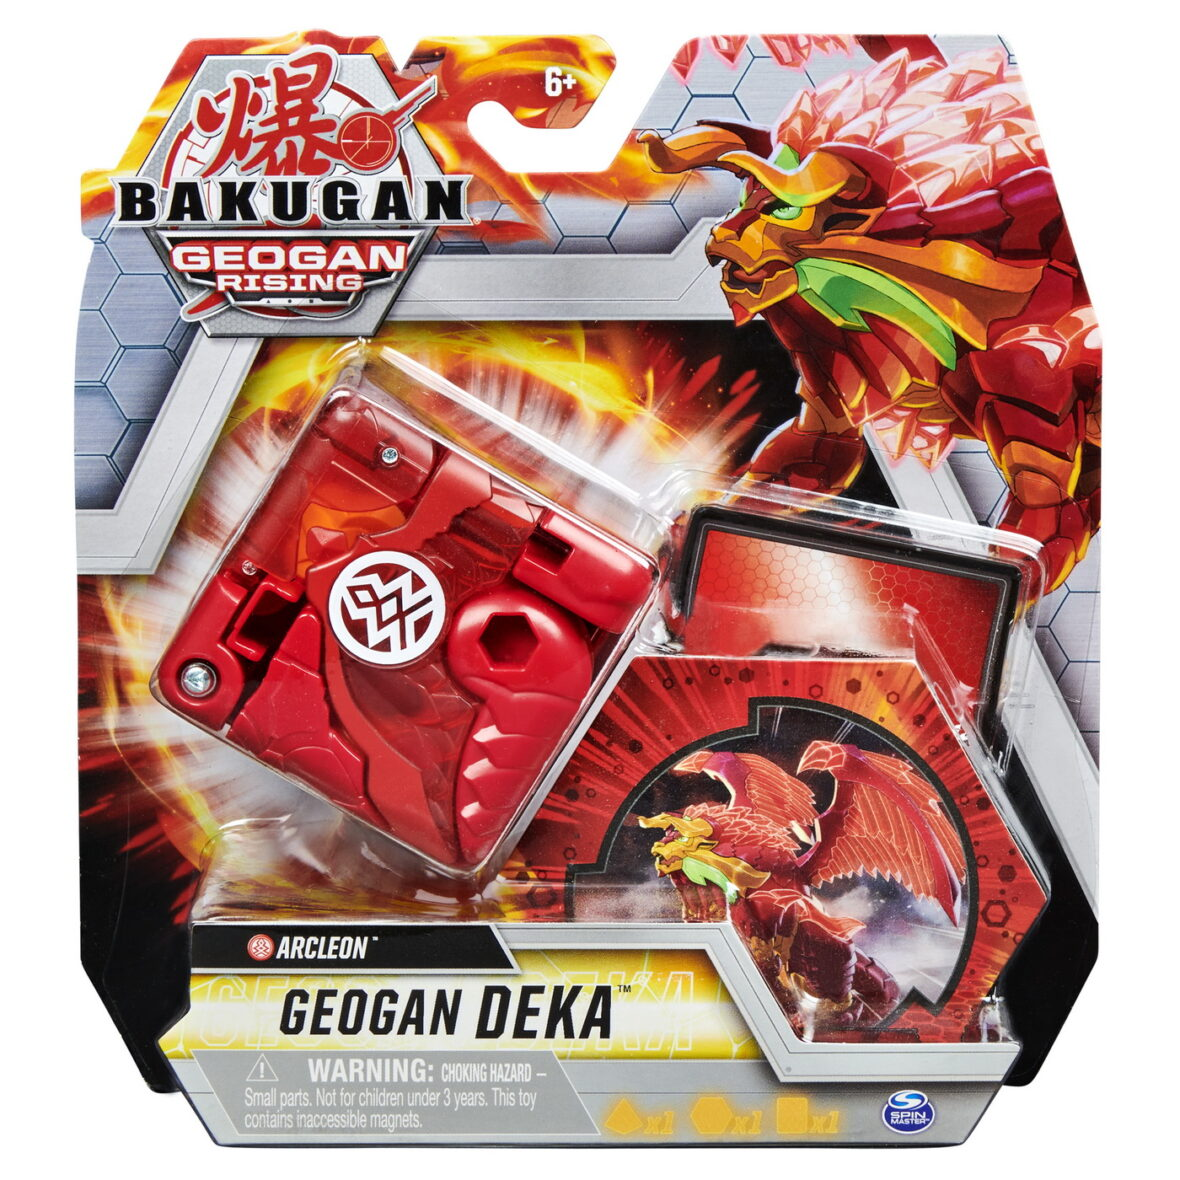 Bakugan S3 Geogan Deka Arcleon